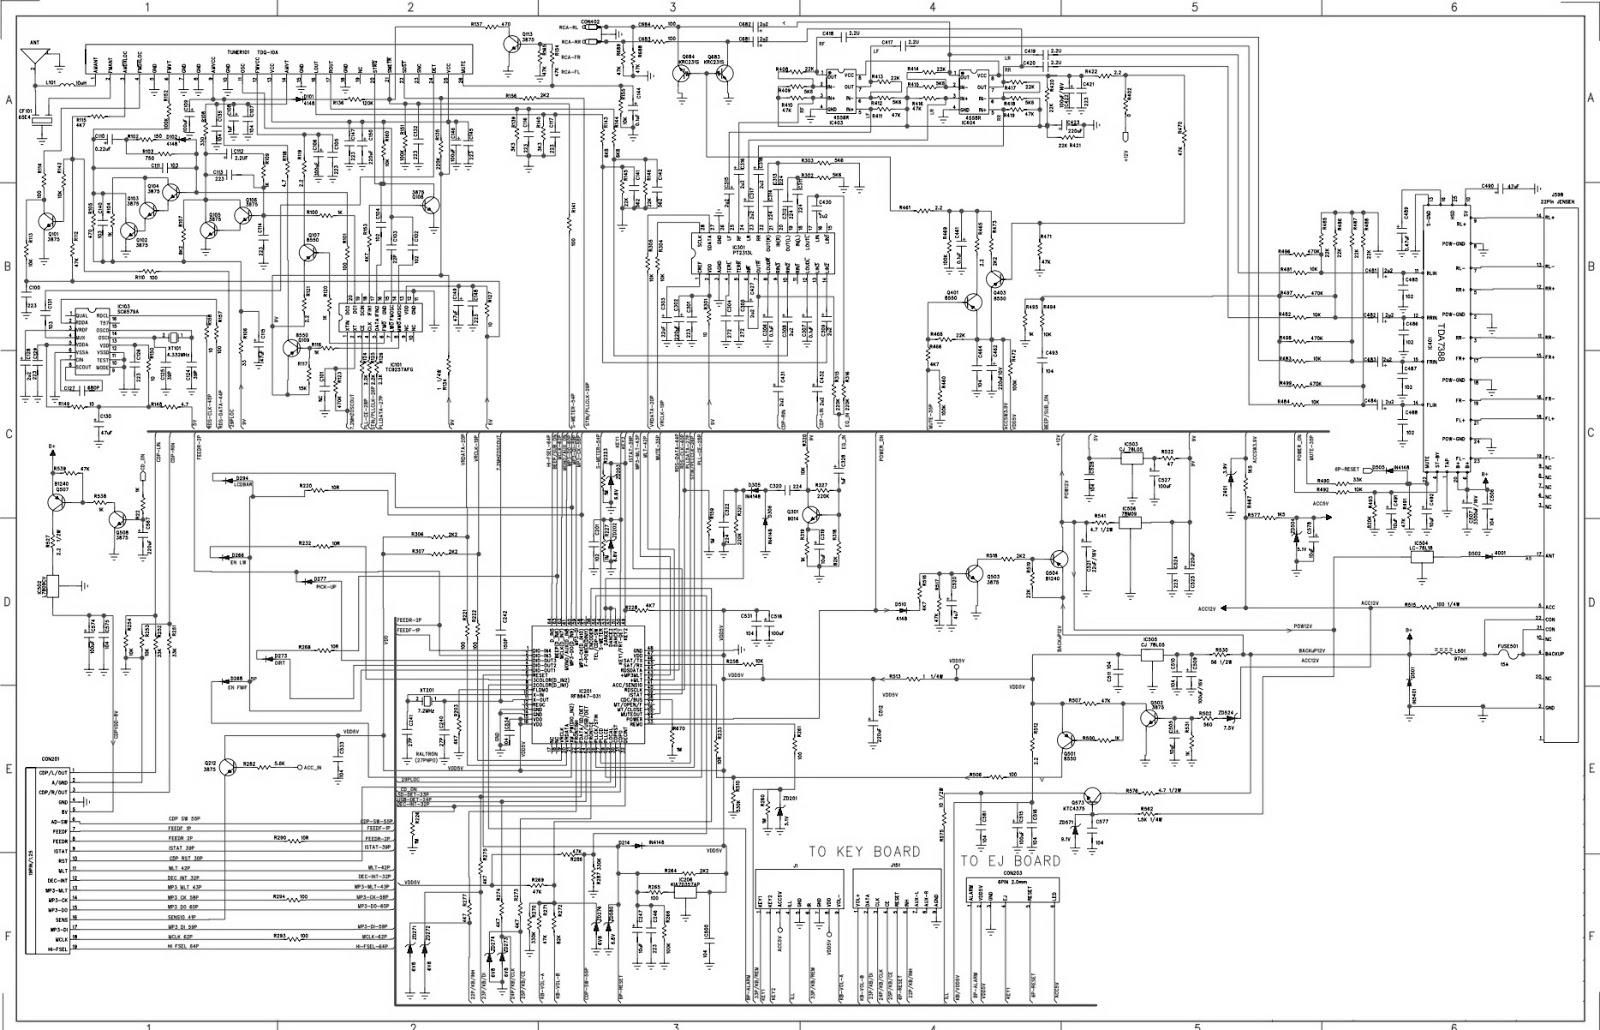 Car audio schematic diagram galleryge 45 of panasonic car 100 audio equalizer circuit diagram audio amplifier circuit swarovskicordoba Image collections